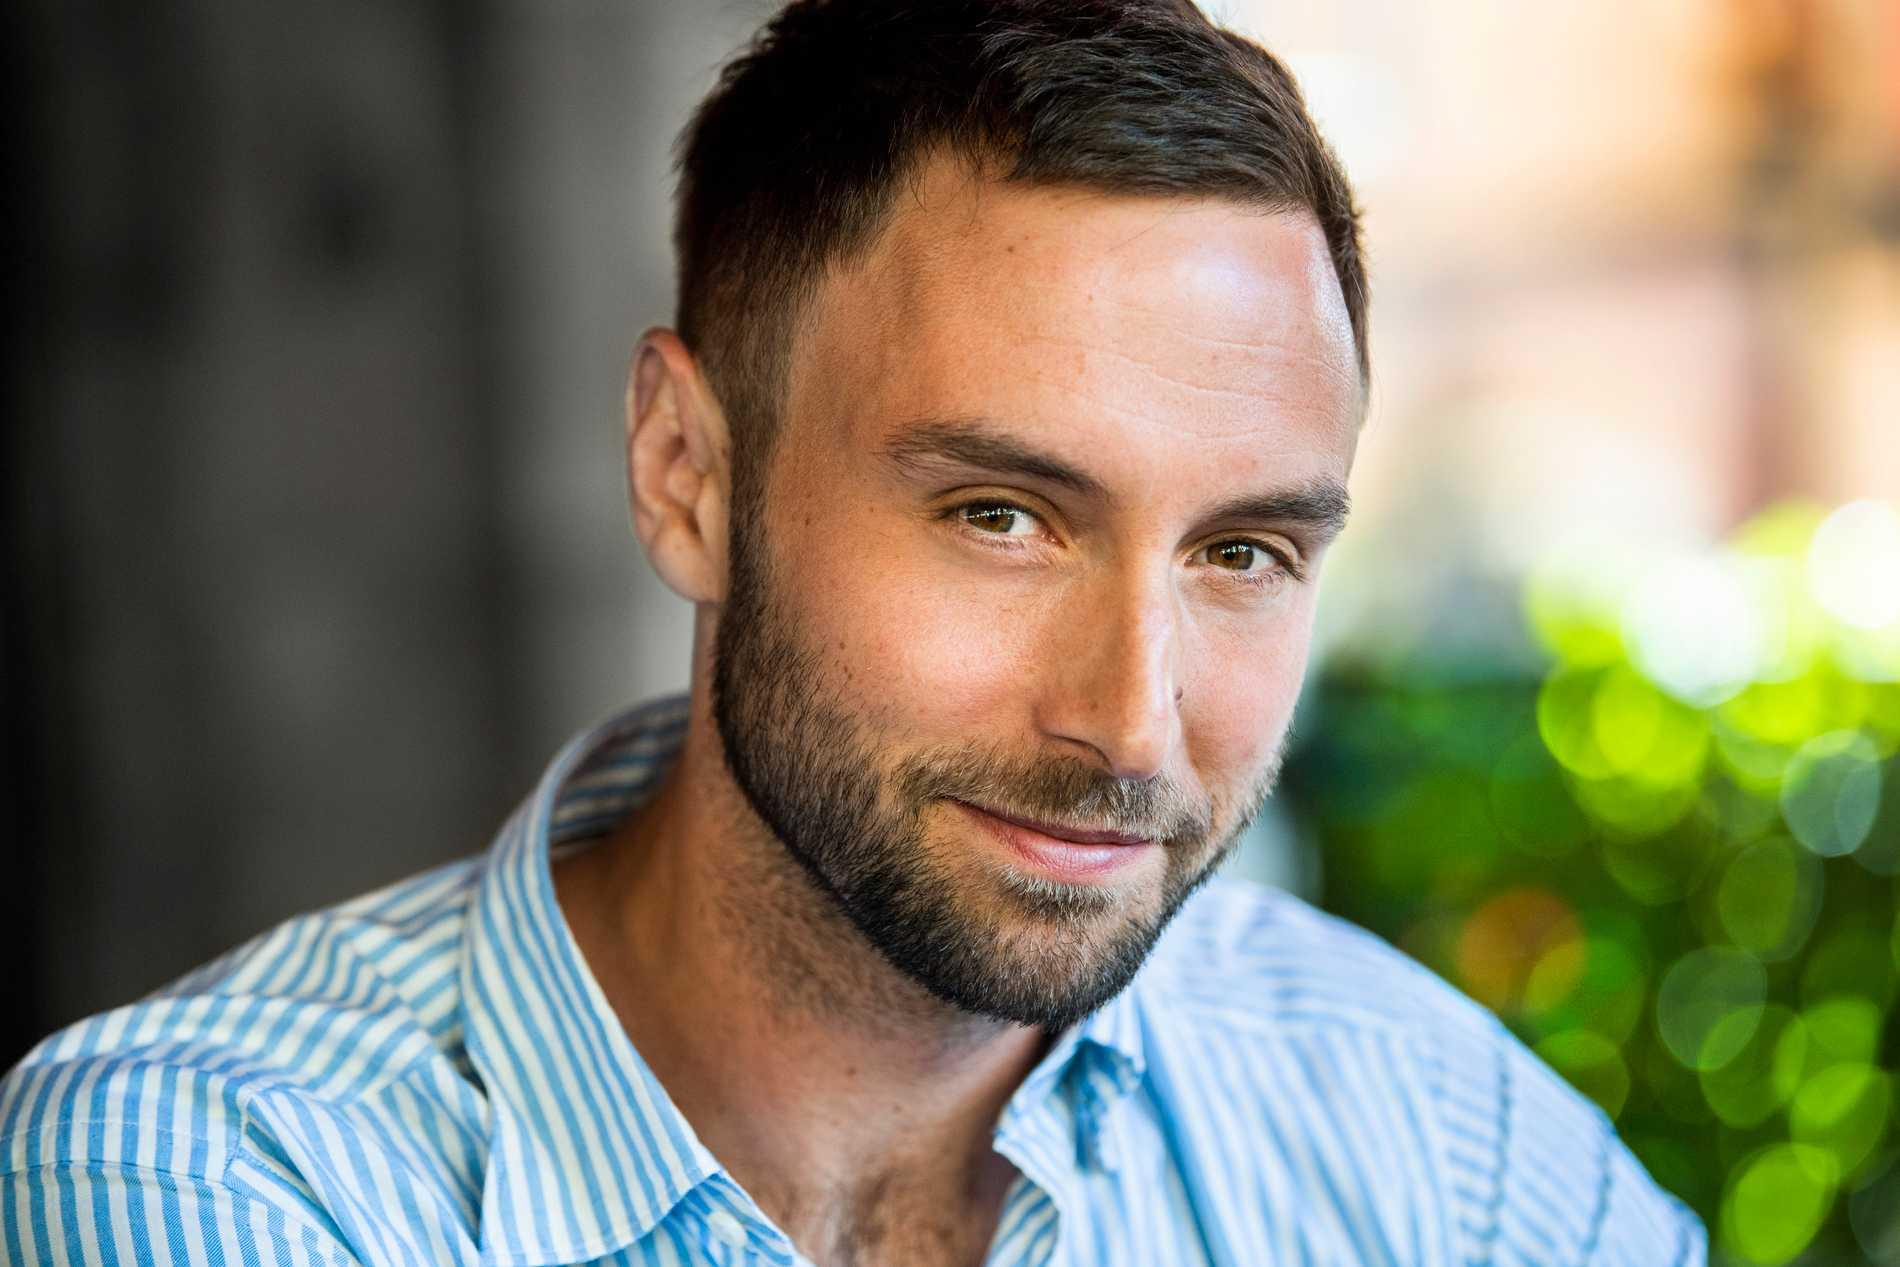 Måns Zelmerlöw | Handsome actors, Actors, Singer